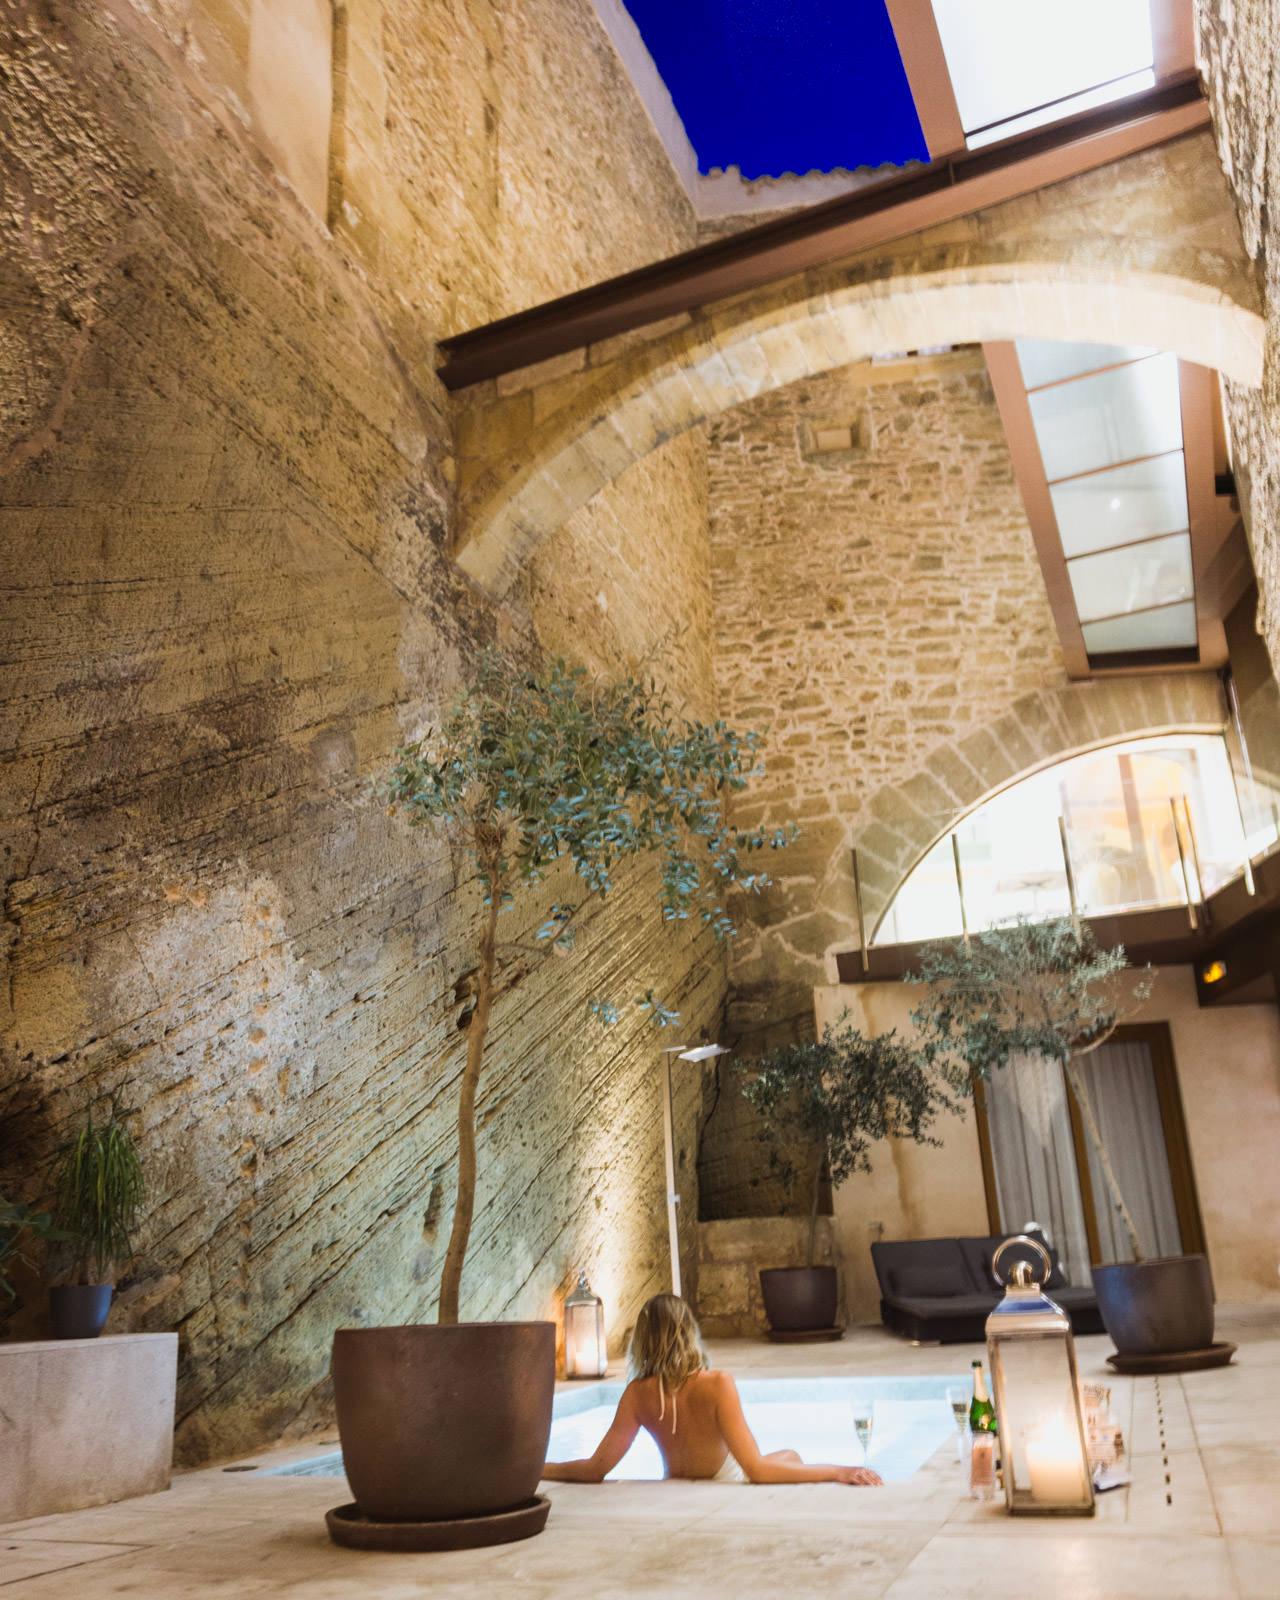 Hotel Can Mostatxins courtyard pool